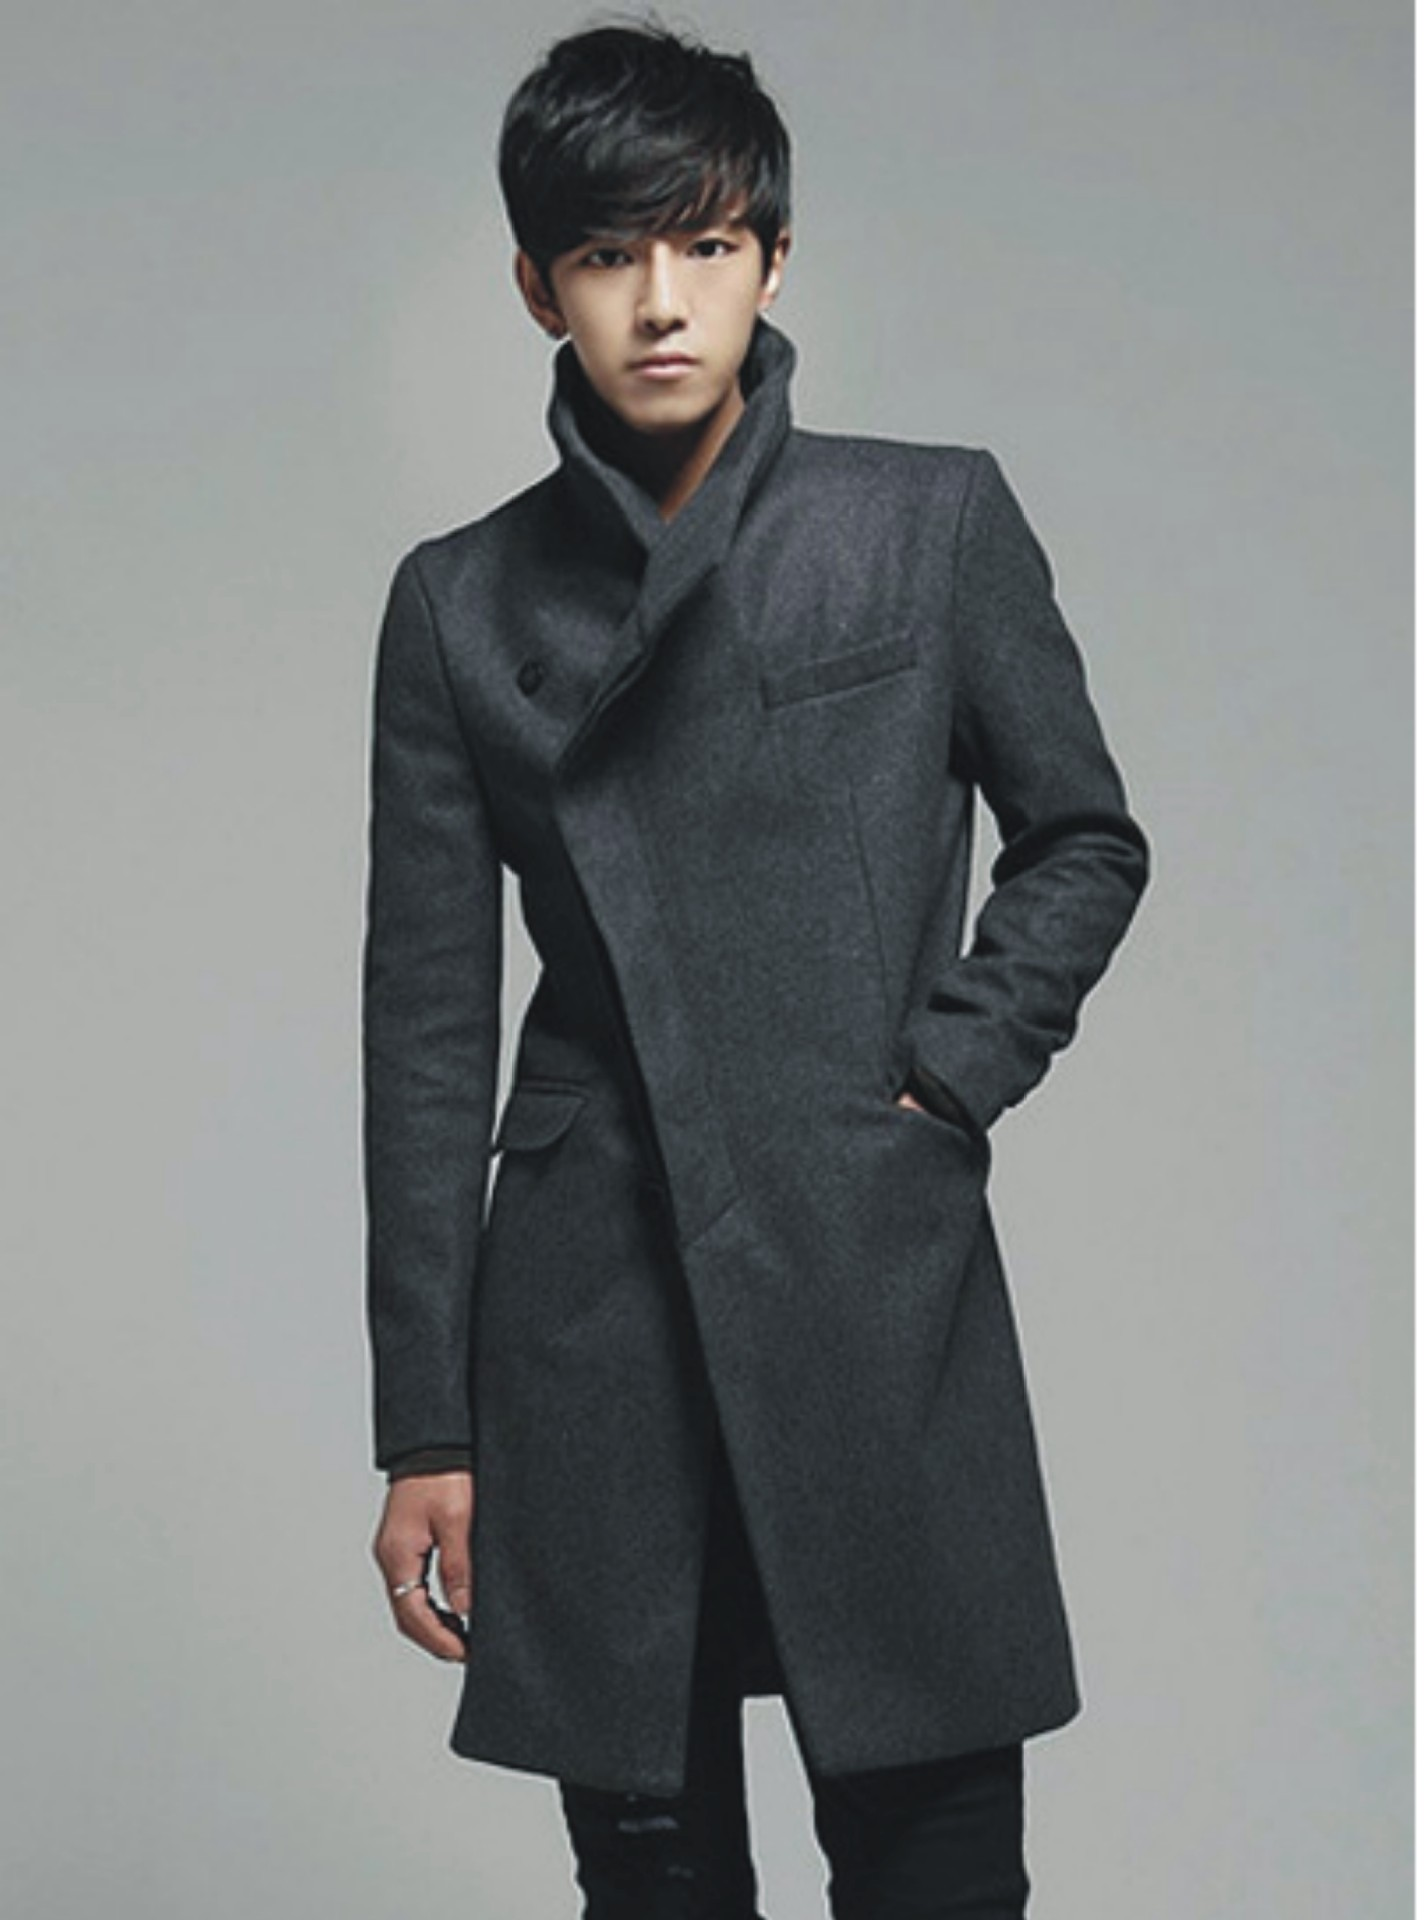 MRMT 2019 Brand Autumn Winter Men's Jackets Body Repair Woolen Overcoat For Male Long Woolen Jacket Outer Wear Clothing Garment